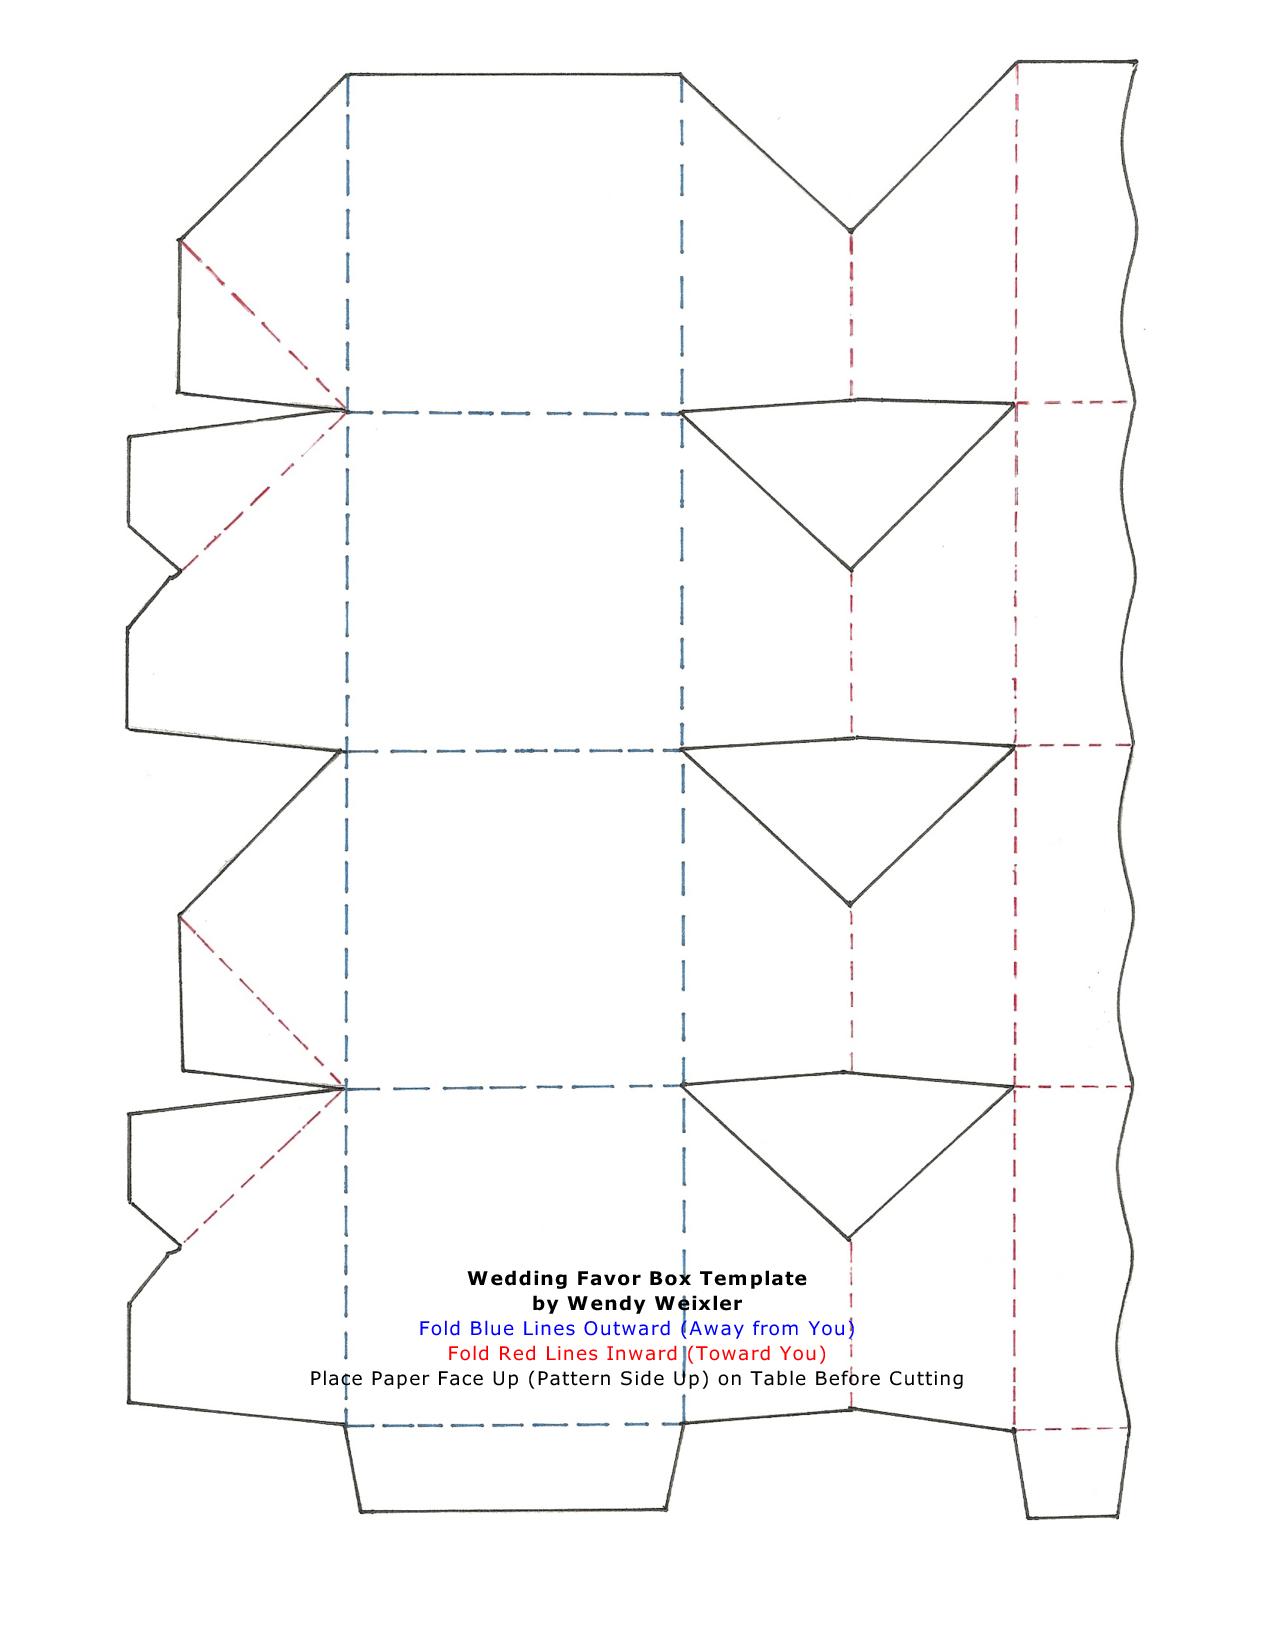 Wedding Favor Box Template by Wendy Weixler Fold Blue Lines | Favor ...